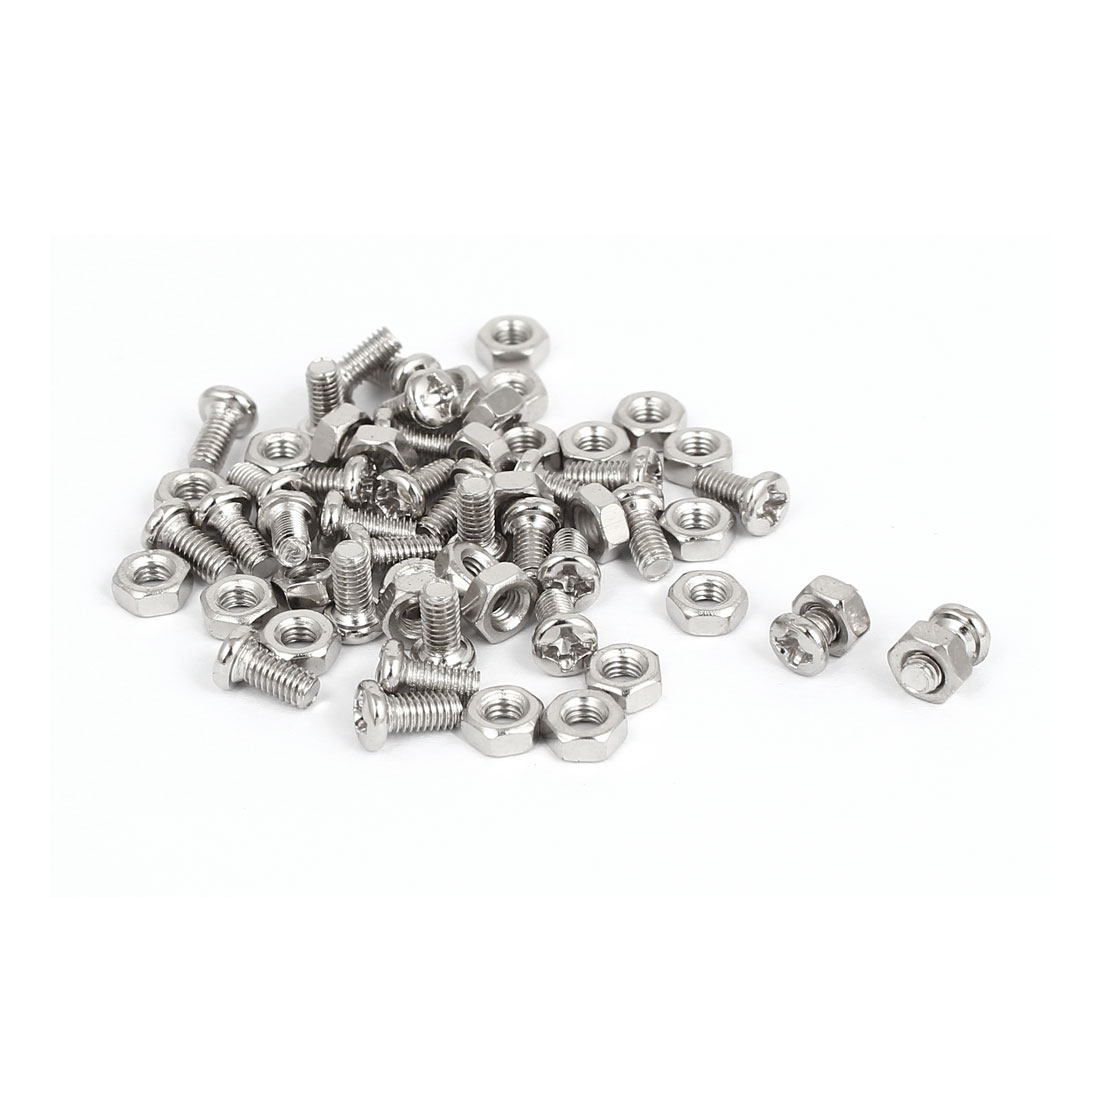 M3 x 6mm Metal Hex Nuts Phillips Round Head Machine Screw Bolt Silver Tone 30pcs